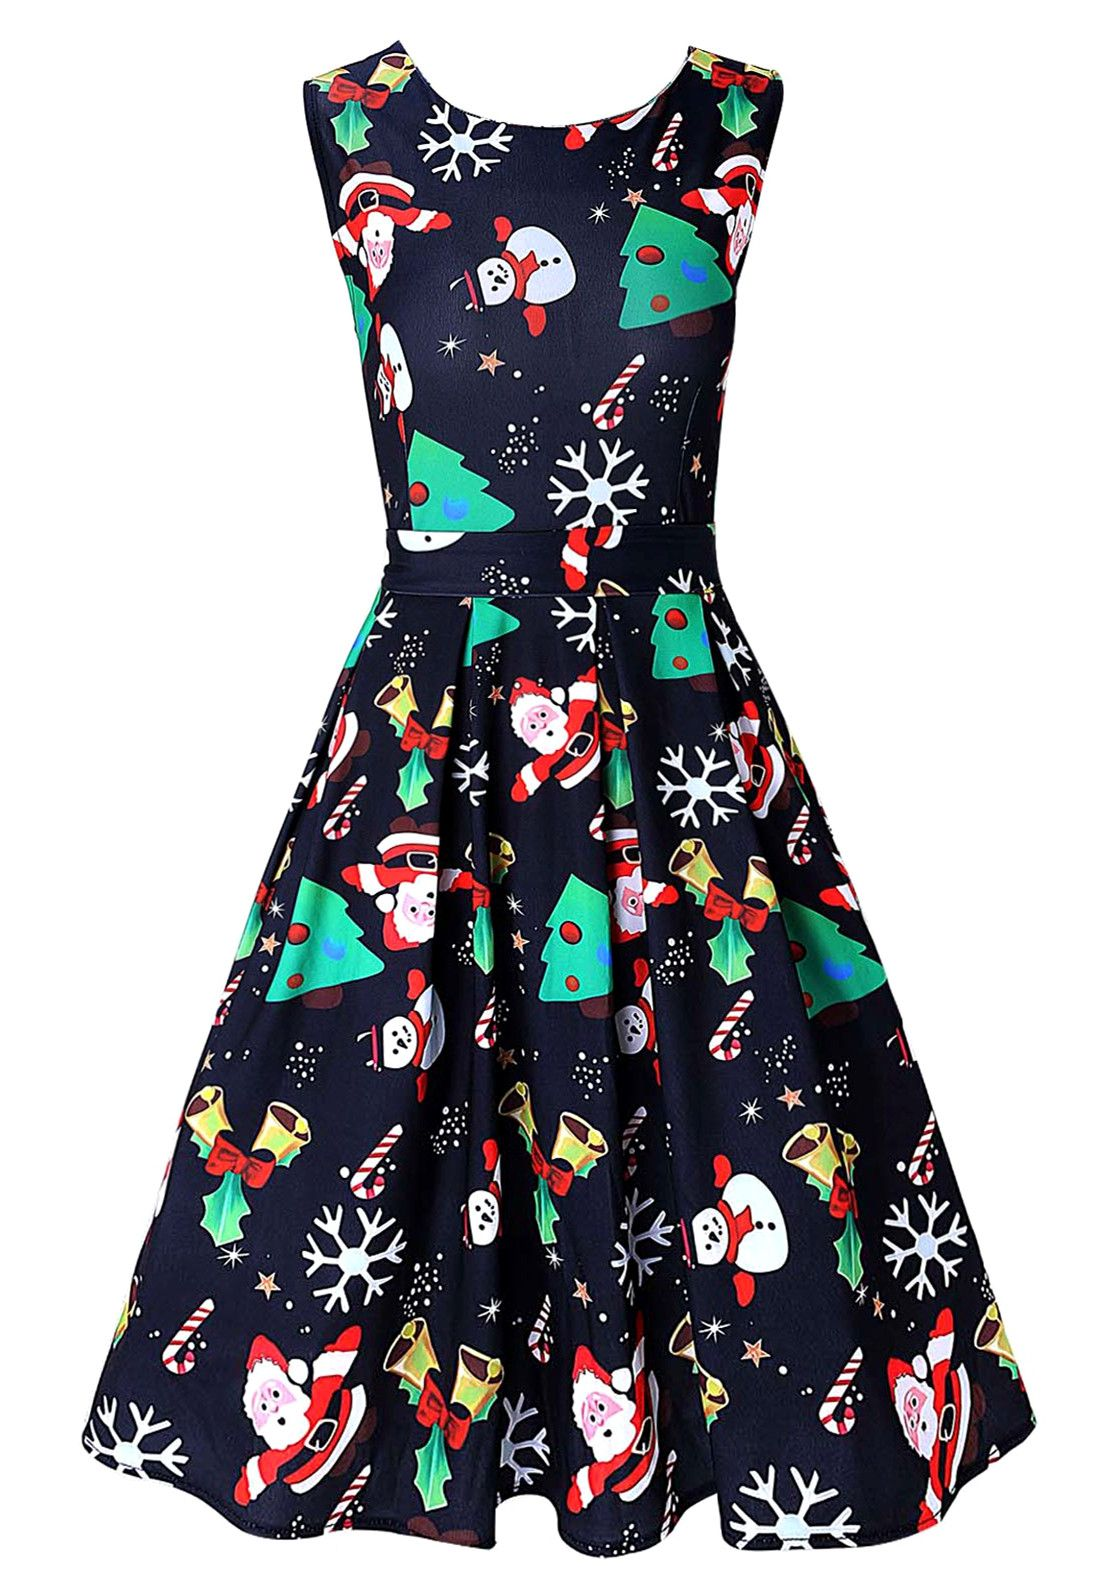 ba17633d3 Vintage Santa Claus Print Christmas Dress - Purplish Blue - 2xl ...